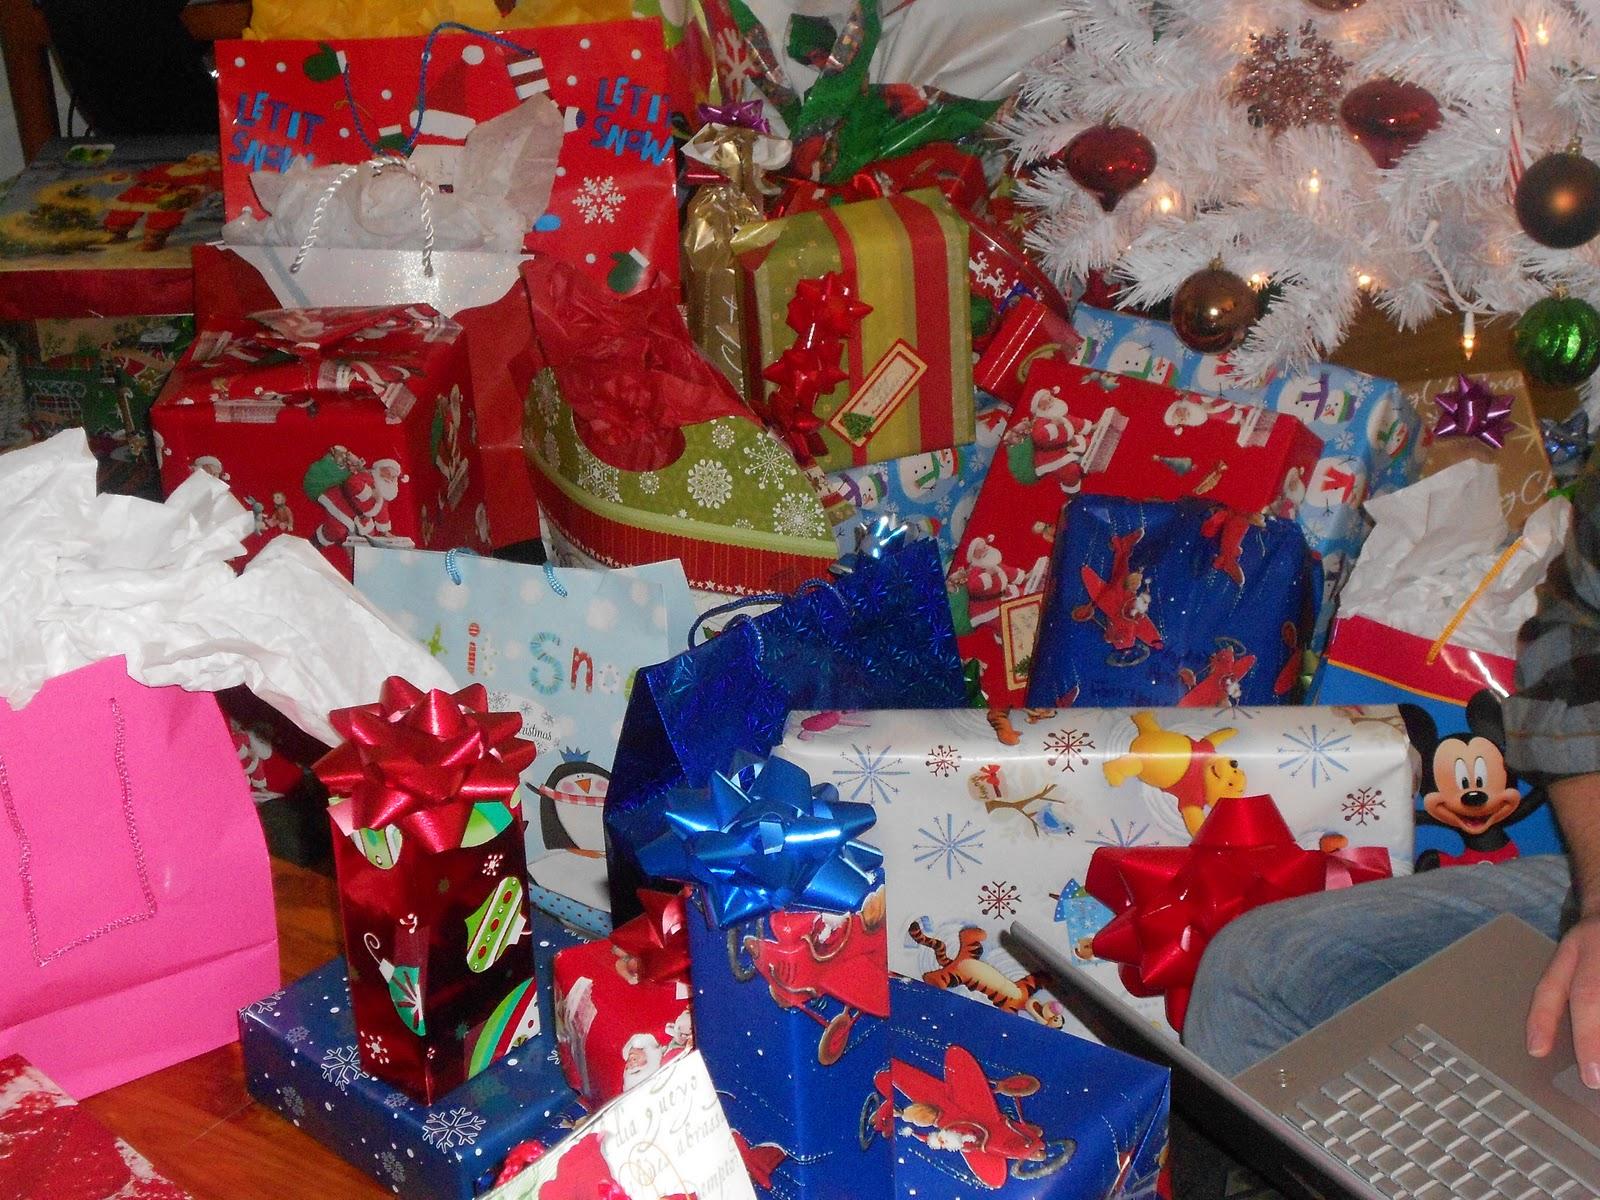 http://3.bp.blogspot.com/-53qw9vePSZY/Tvf39YiO3mI/AAAAAAAAERM/KYtPpCTcT48/s1600/Christmas+2011+077.JPG